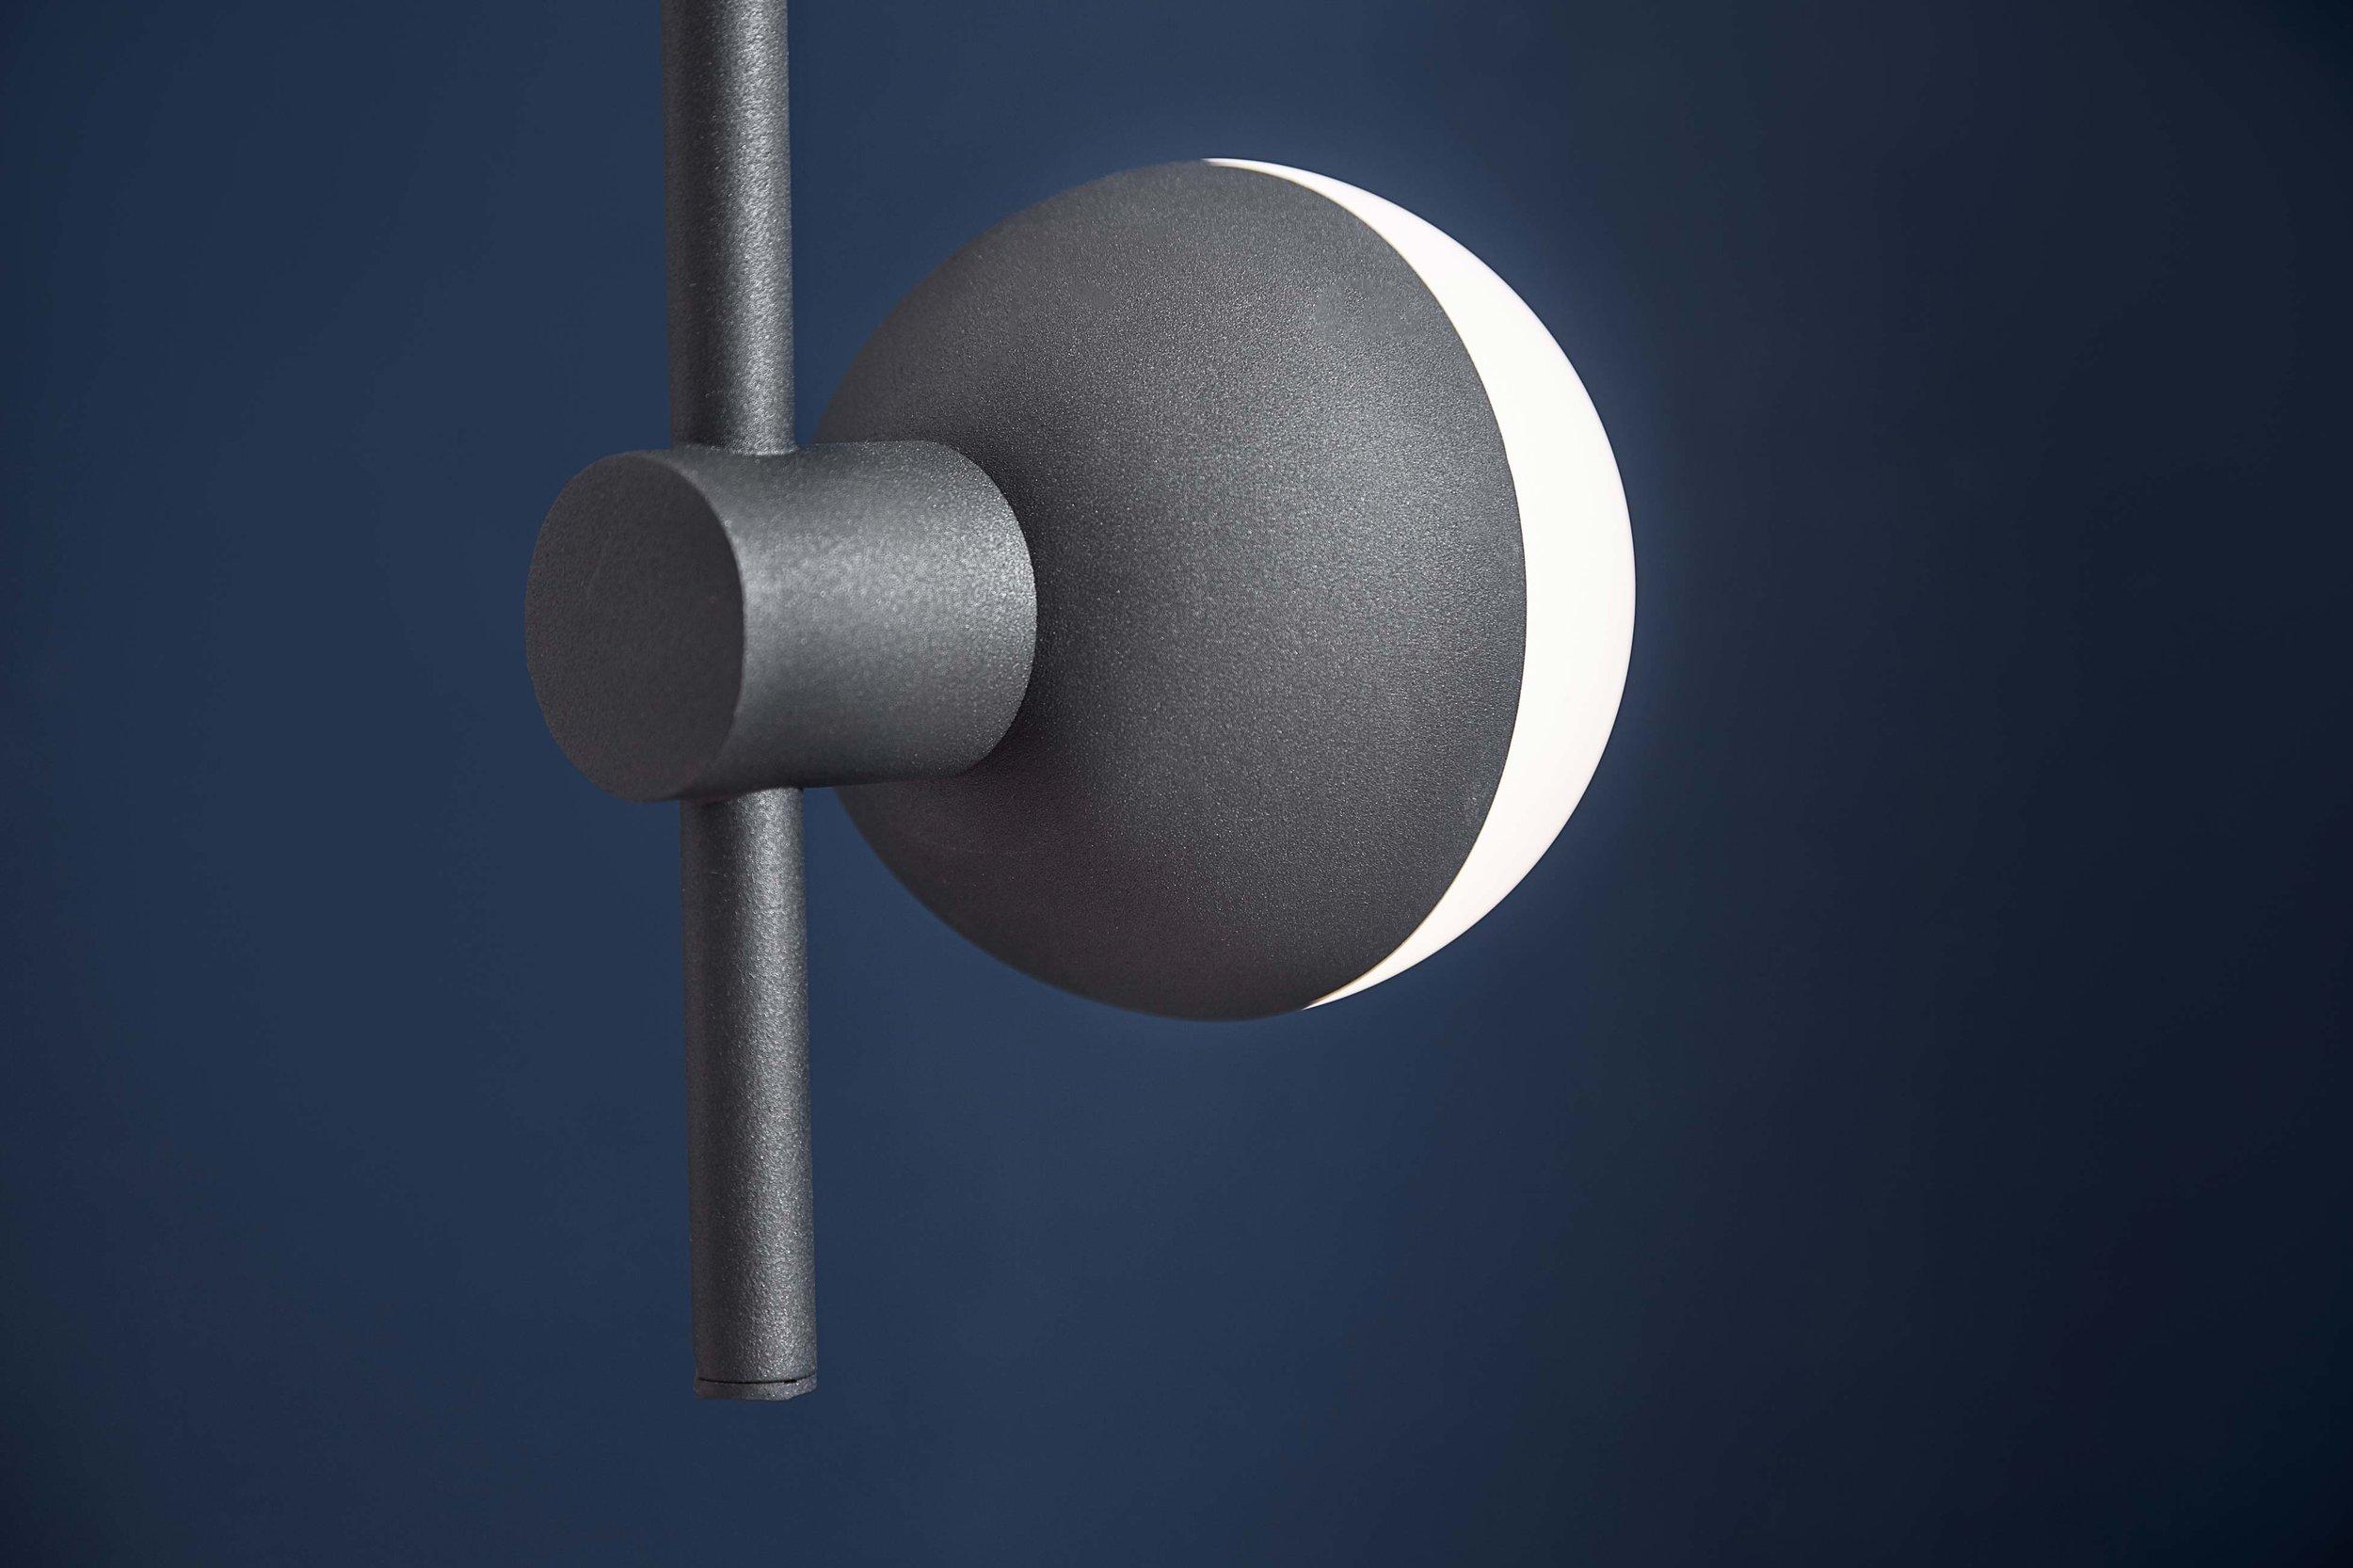 Fabian-chandelier-vertical-structure-black---lifestyle-closeup-Horsens-studio-1507.jpg